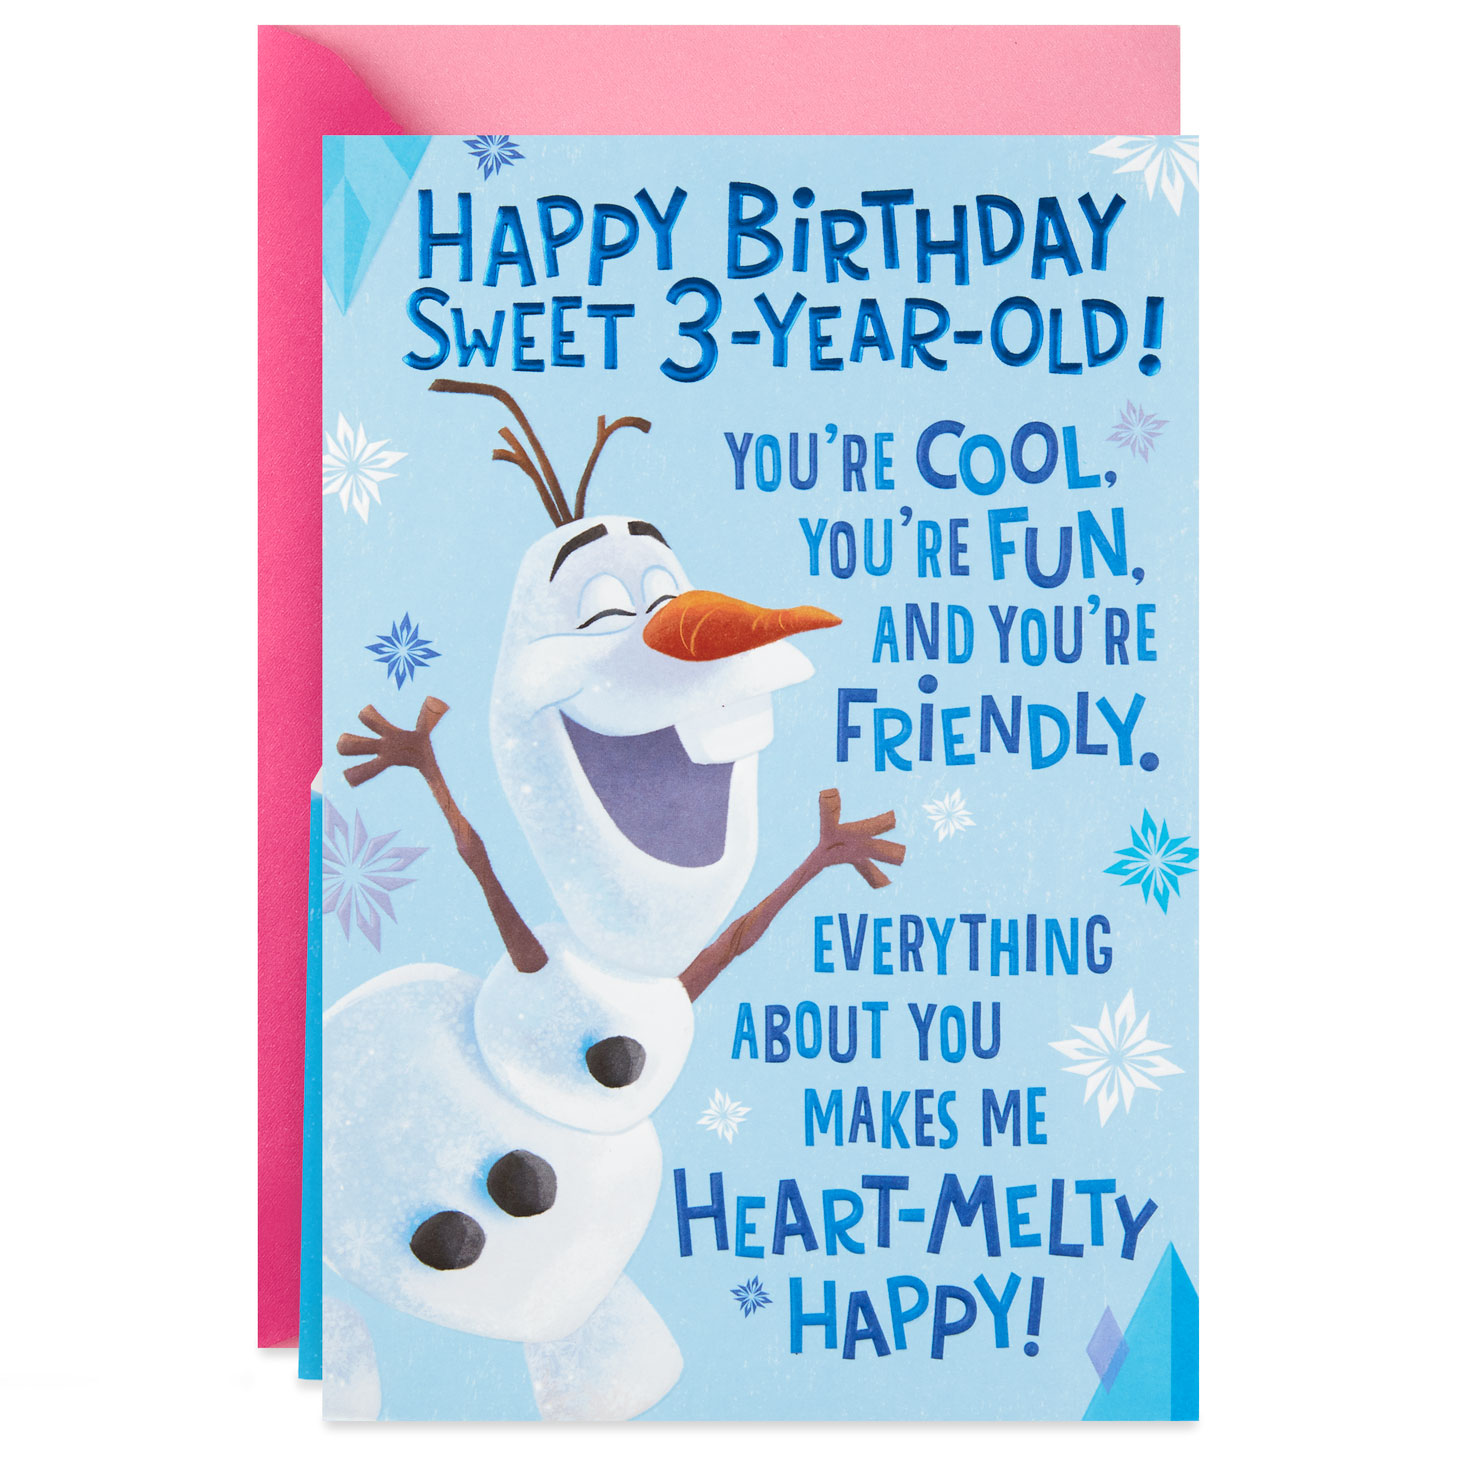 Disney Frozen Olaf Heart-Melty Happy 3rd Pop Up Birthday